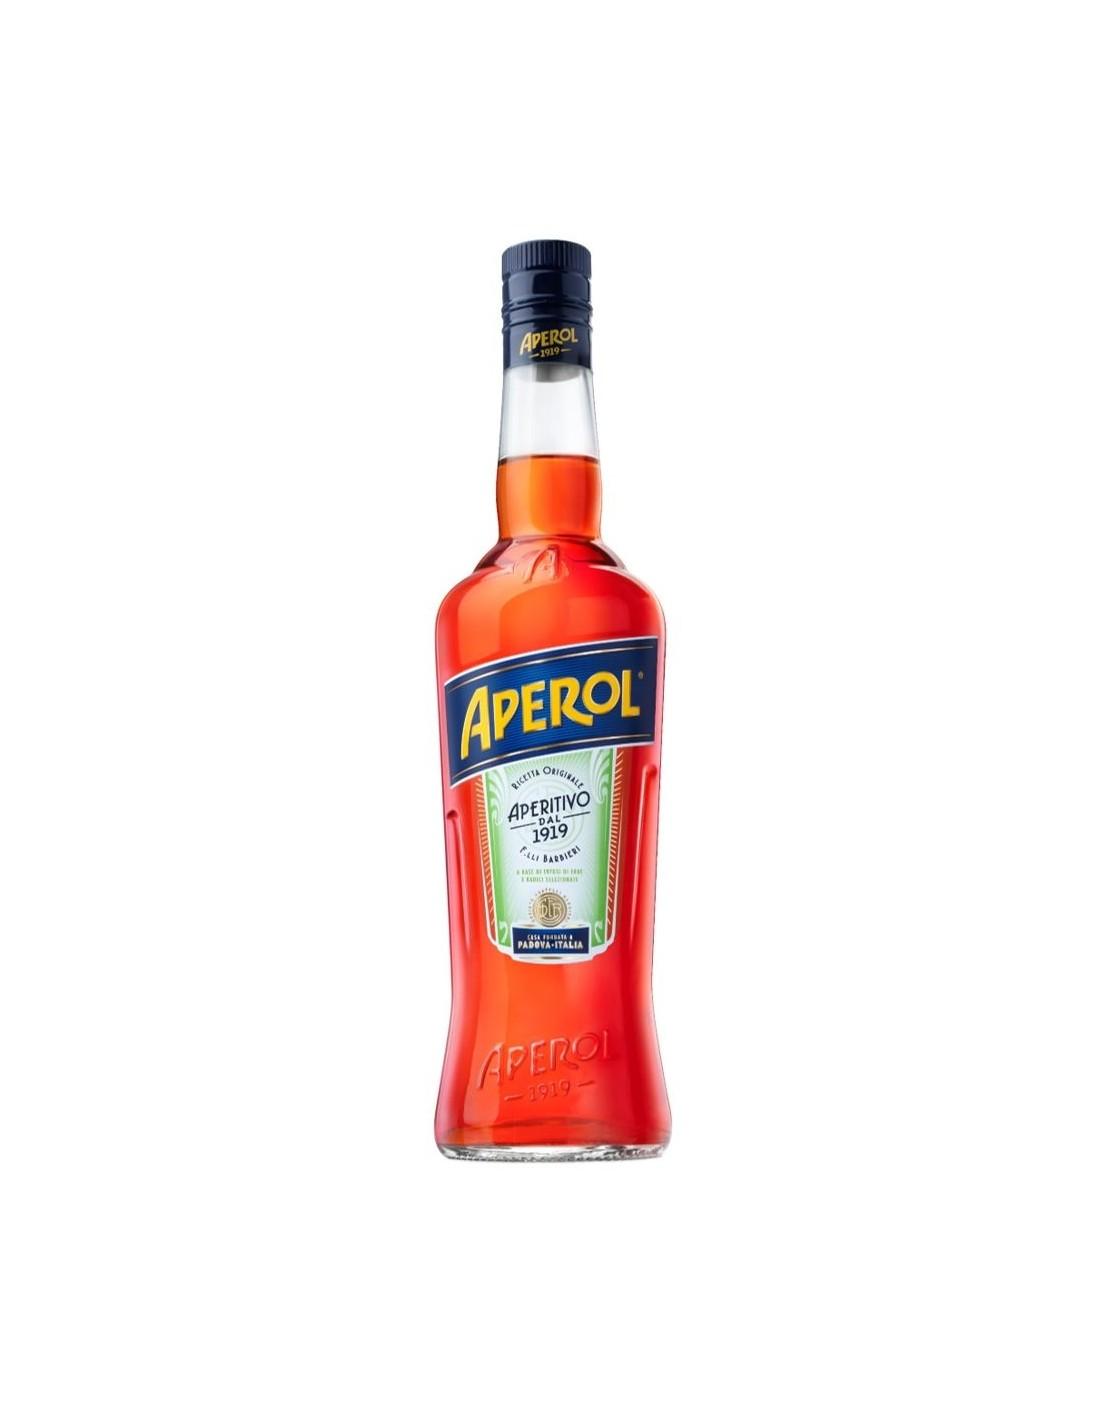 Aperitiv Aperol, 11% alc., 1L, Italia